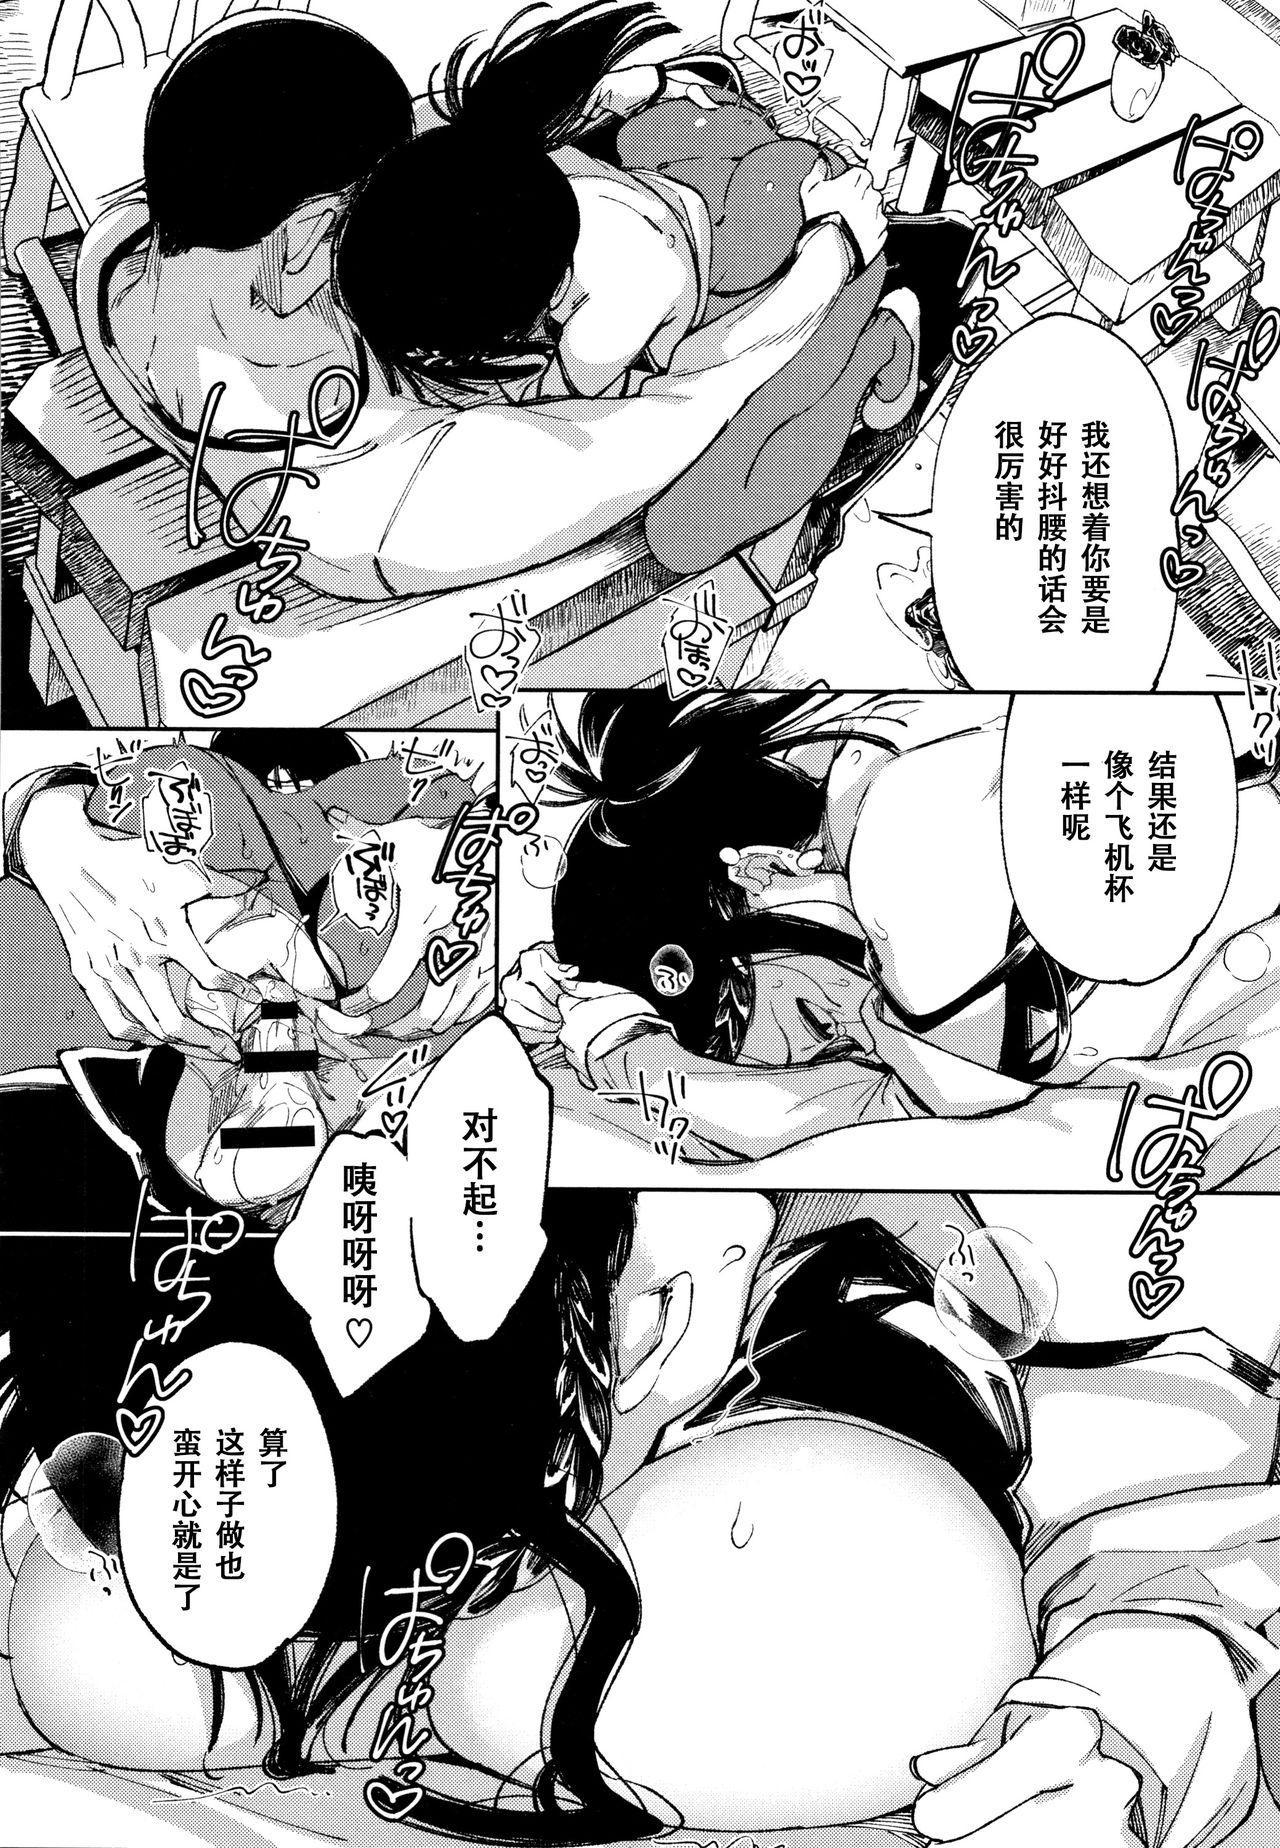 [Achumuchi] Saijaku Gal wa Ikizurai! - The weakest pussy is hard to go.ch.1-8 [Chinese] [战栗的玻璃棒汉化] [Ongoing] 190